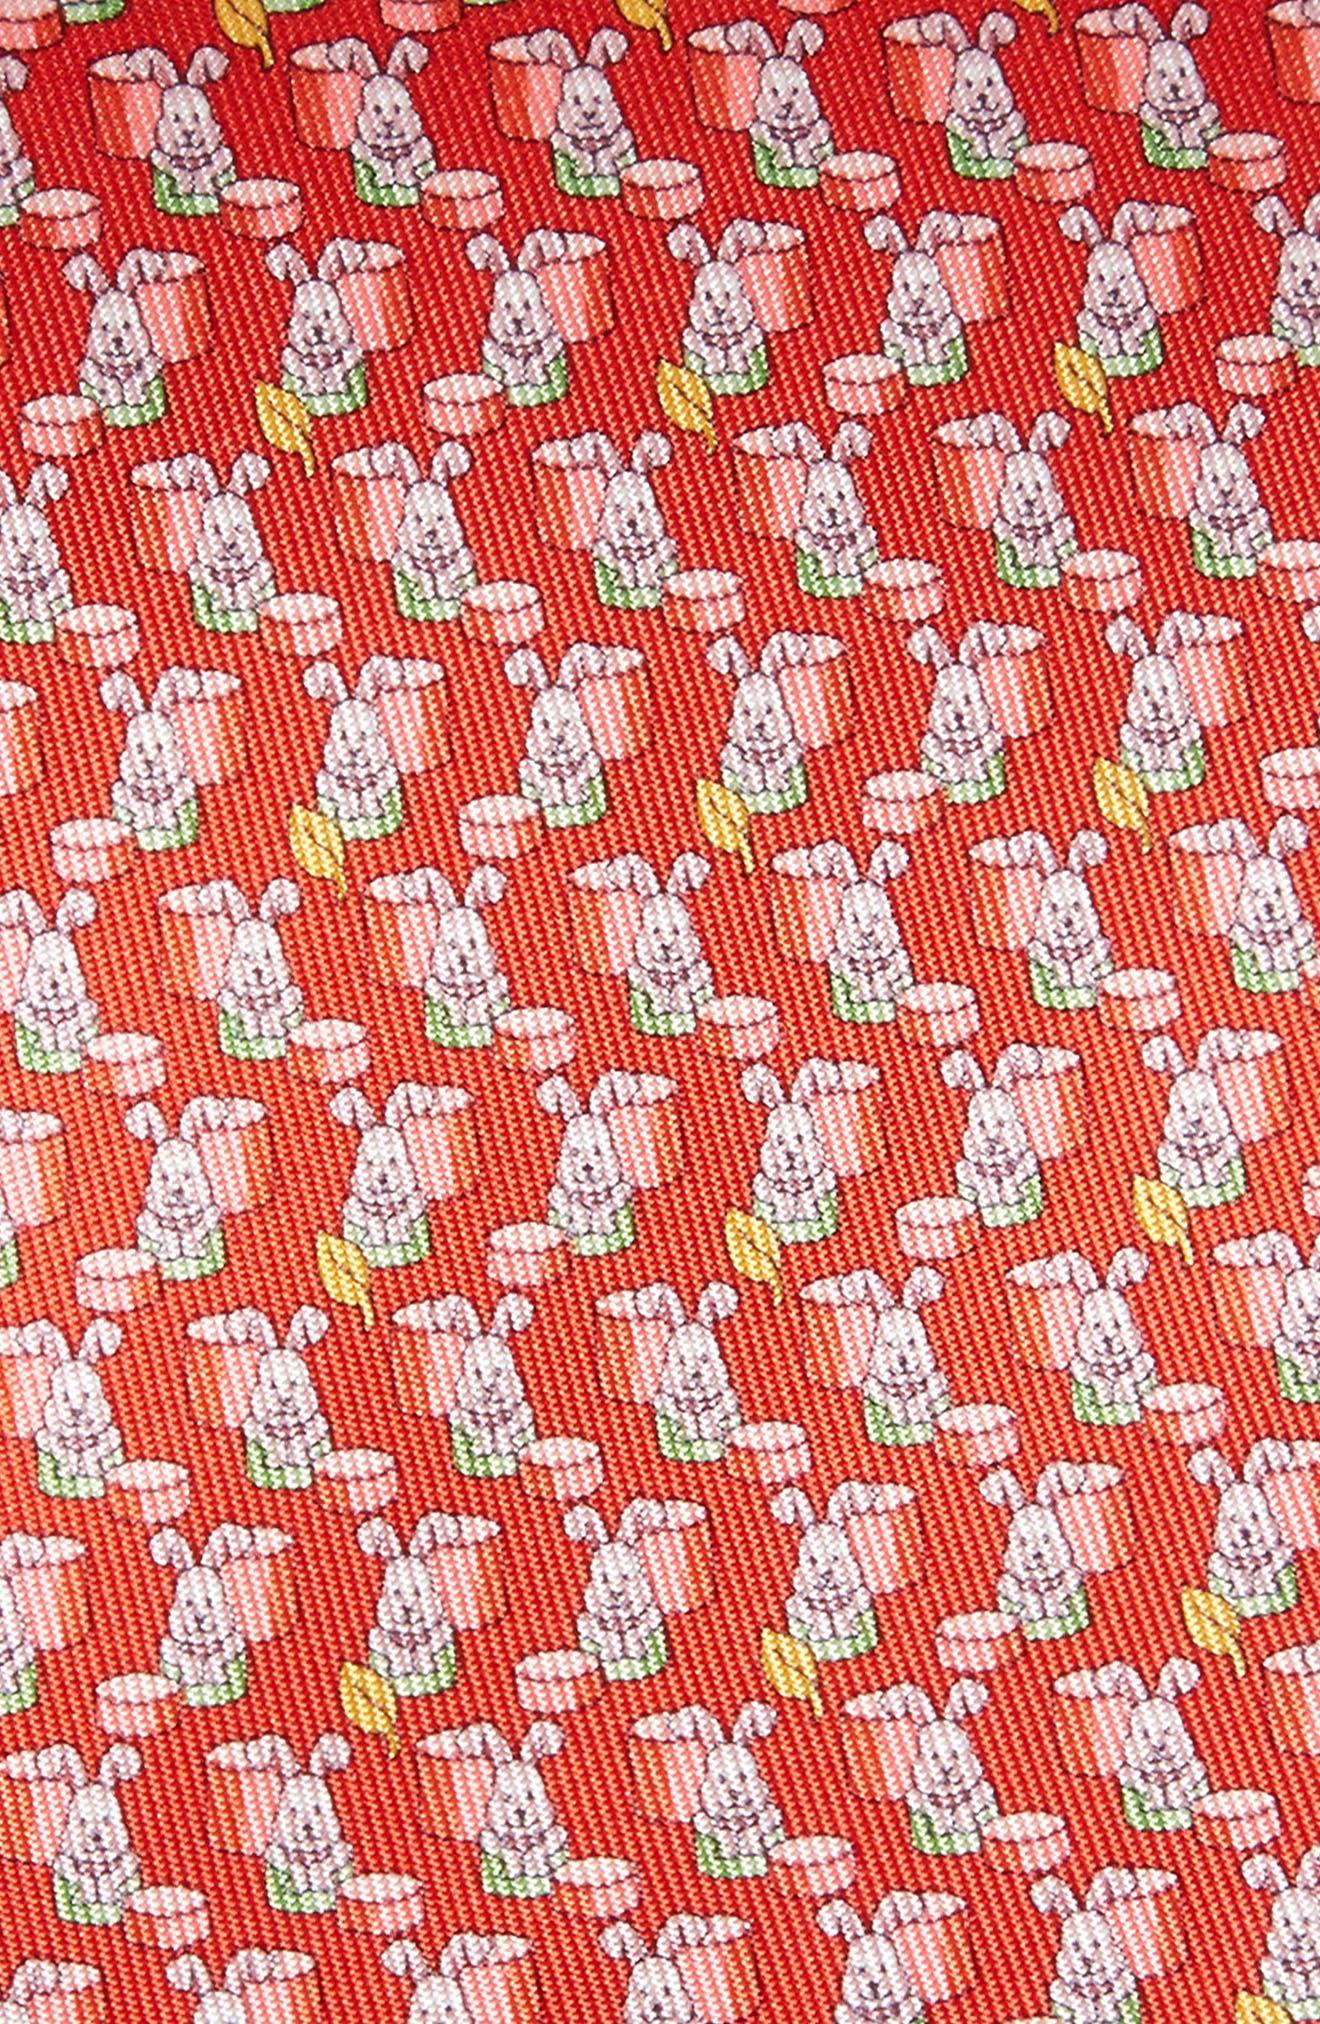 Bunny Print Silk Tie,                             Alternate thumbnail 5, color,